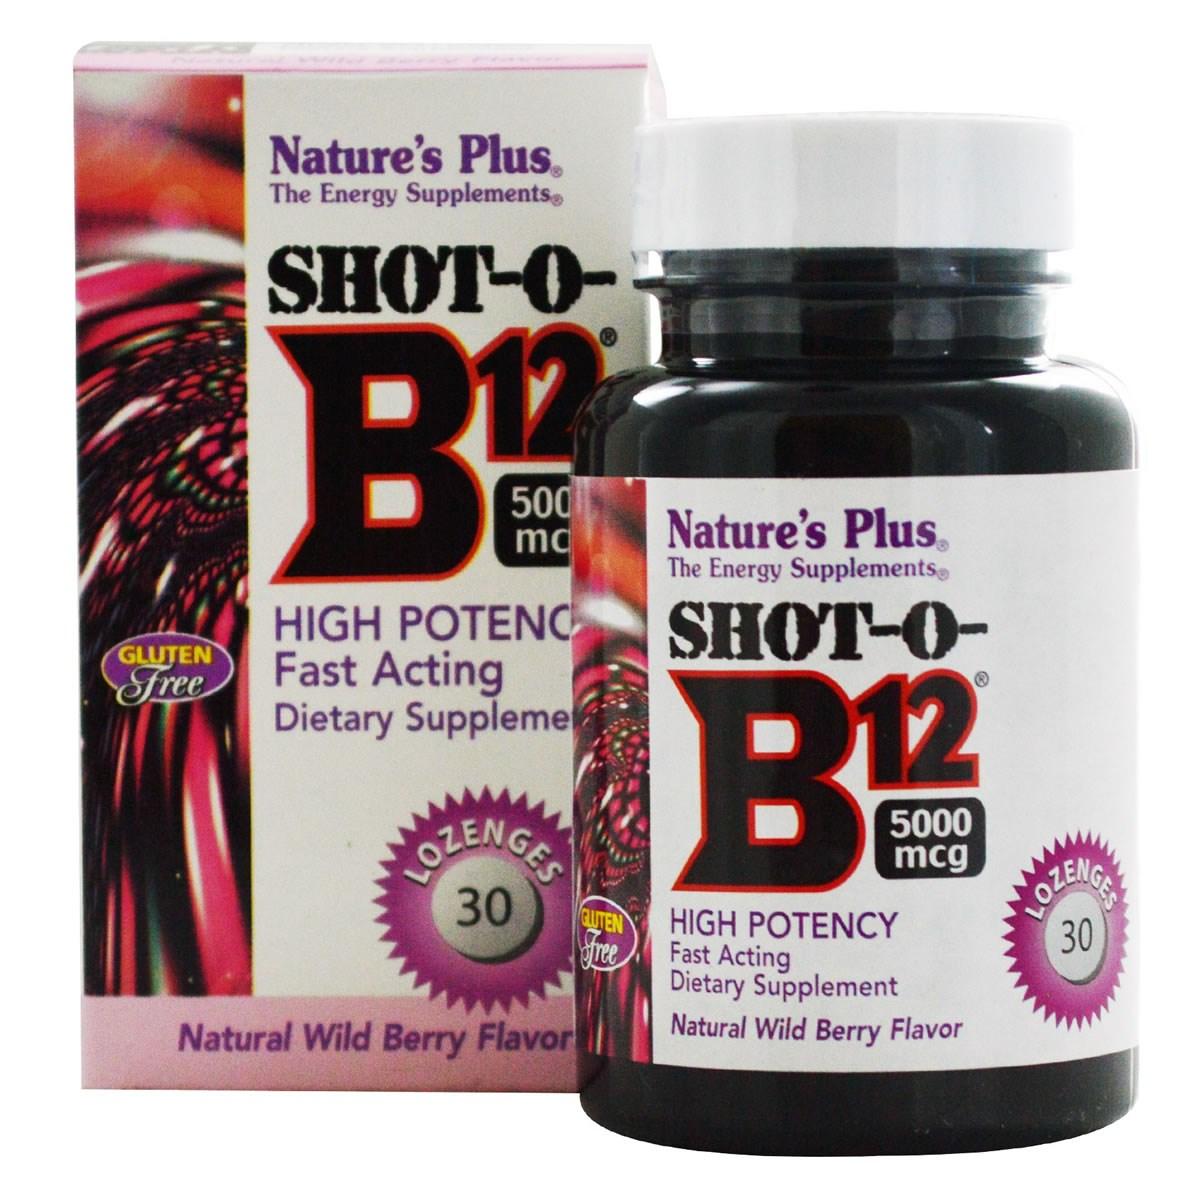 Natures Plus Shot-O-B12 5000 mcg Lozenges - Natural Wild Berry Flavour